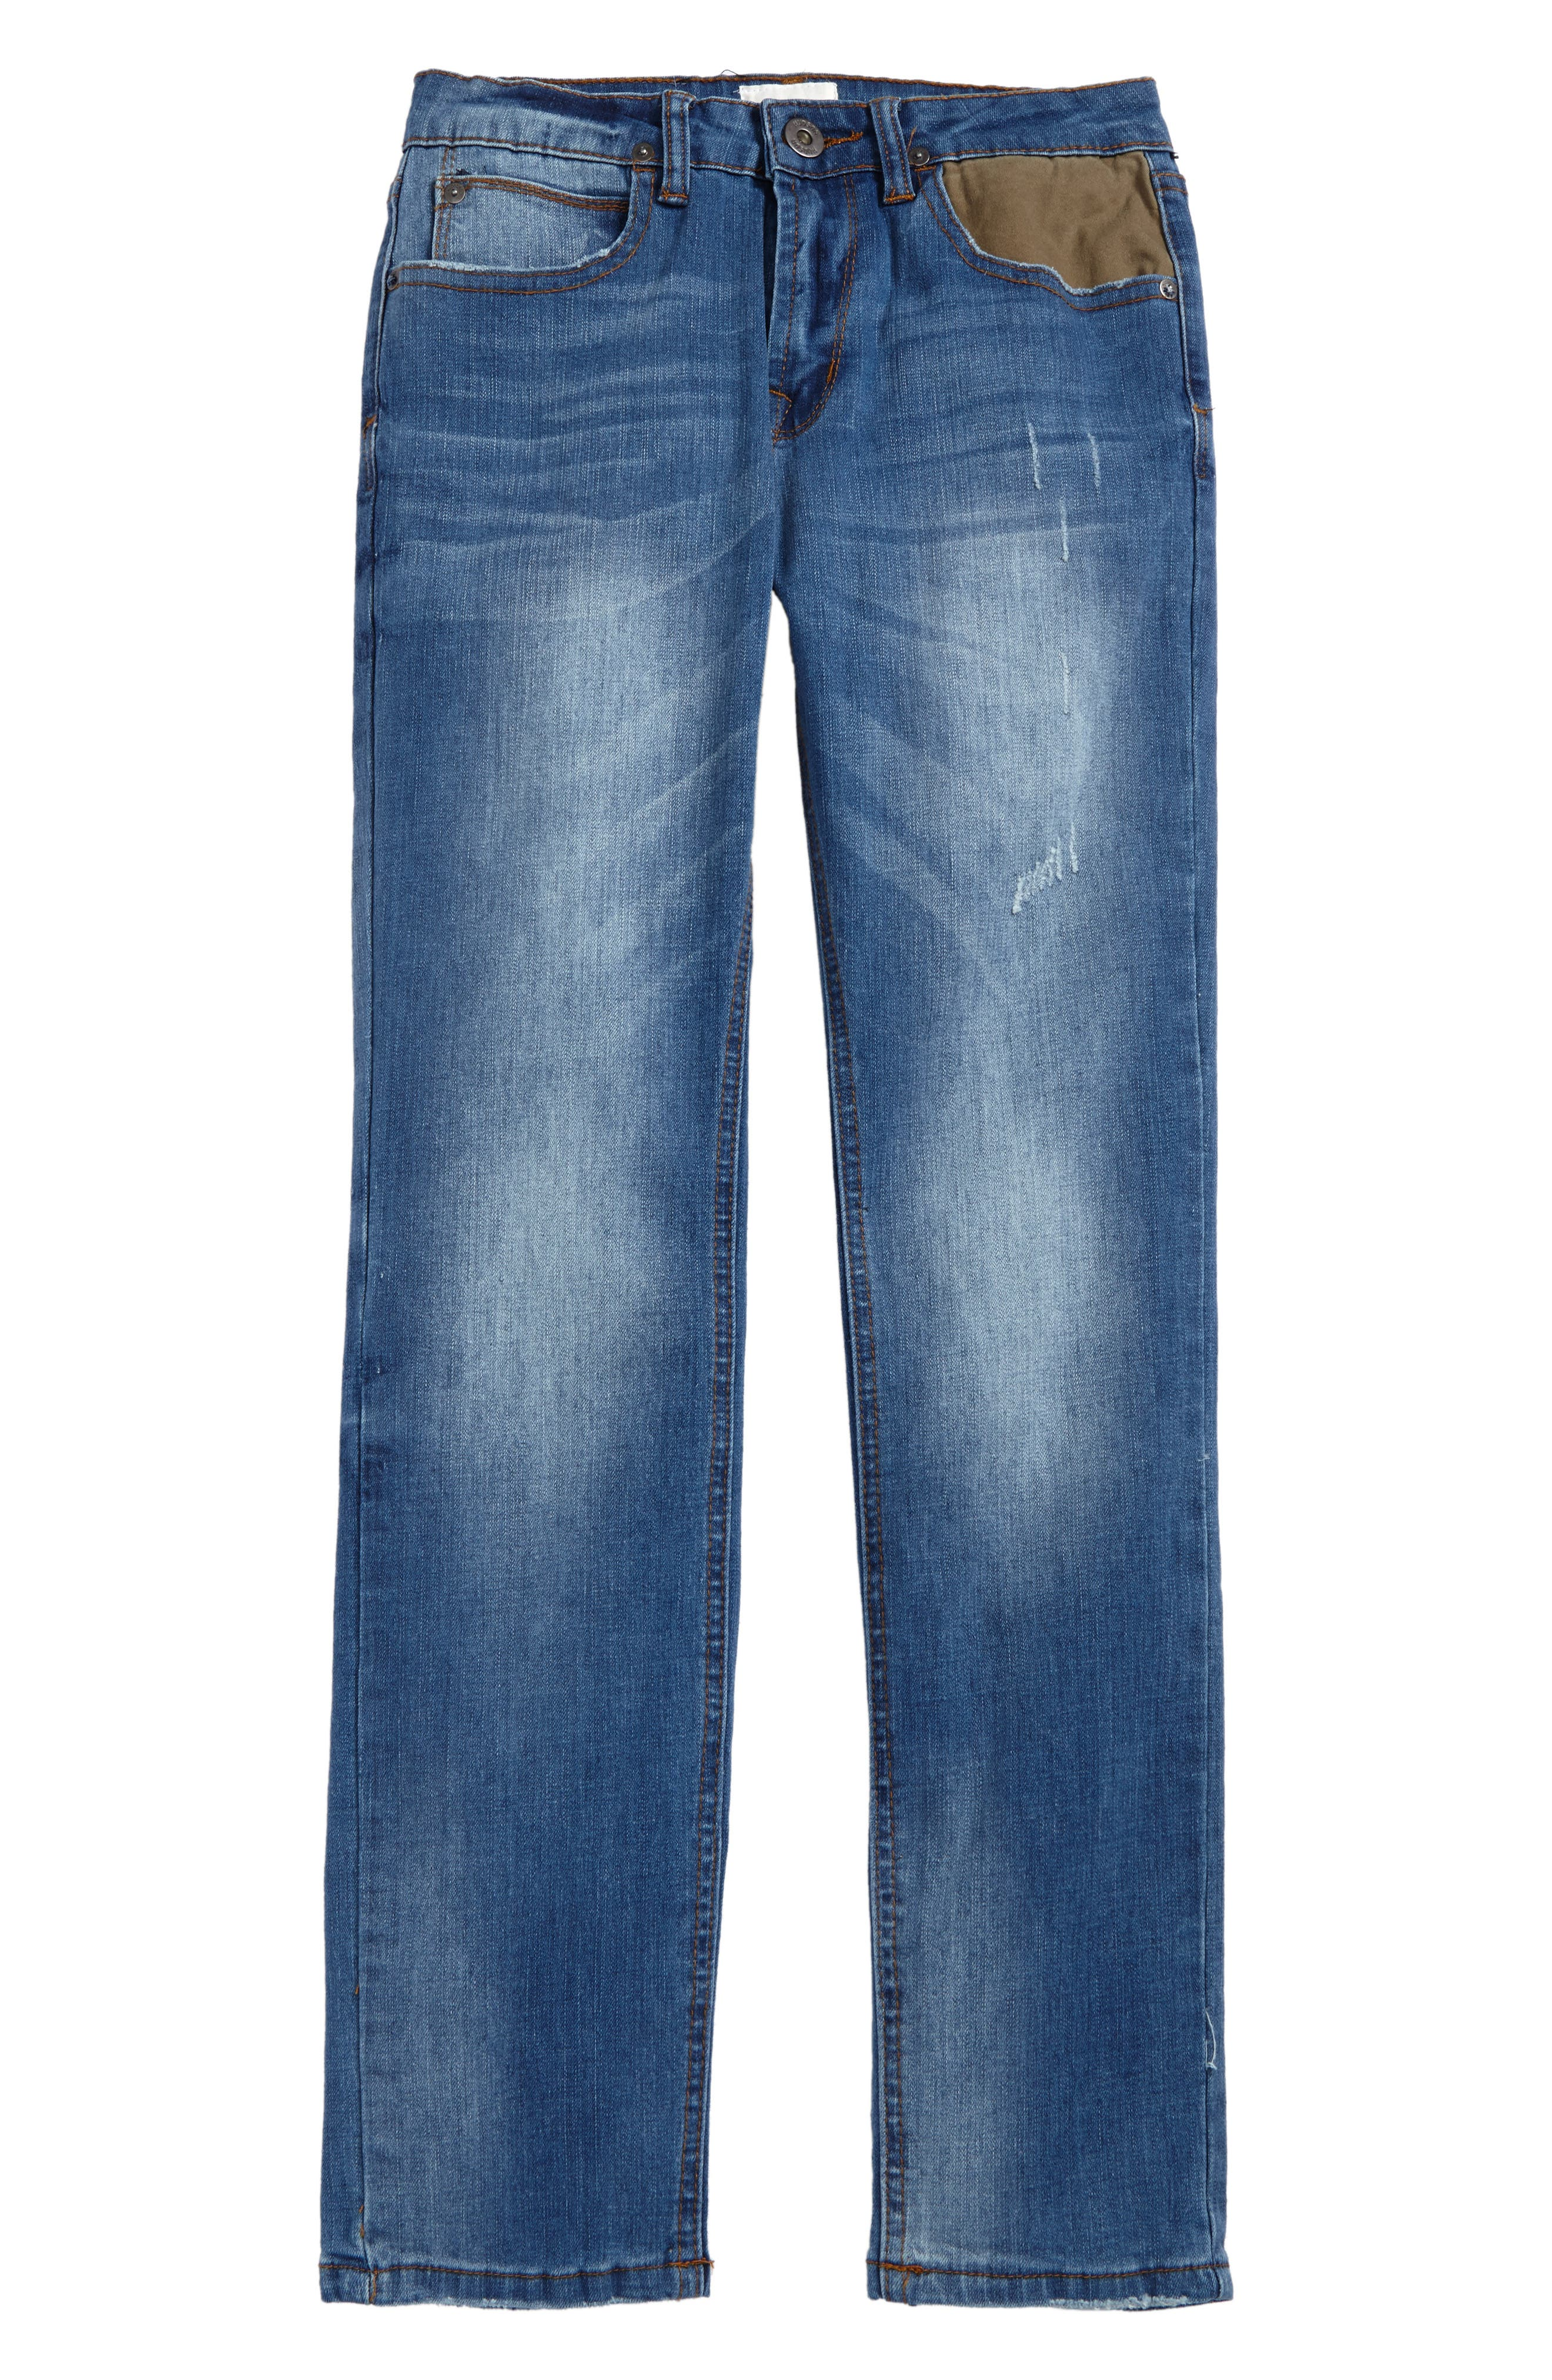 Jagger Slim Fit Straight Leg Jeans,                             Main thumbnail 1, color,                             Zenith